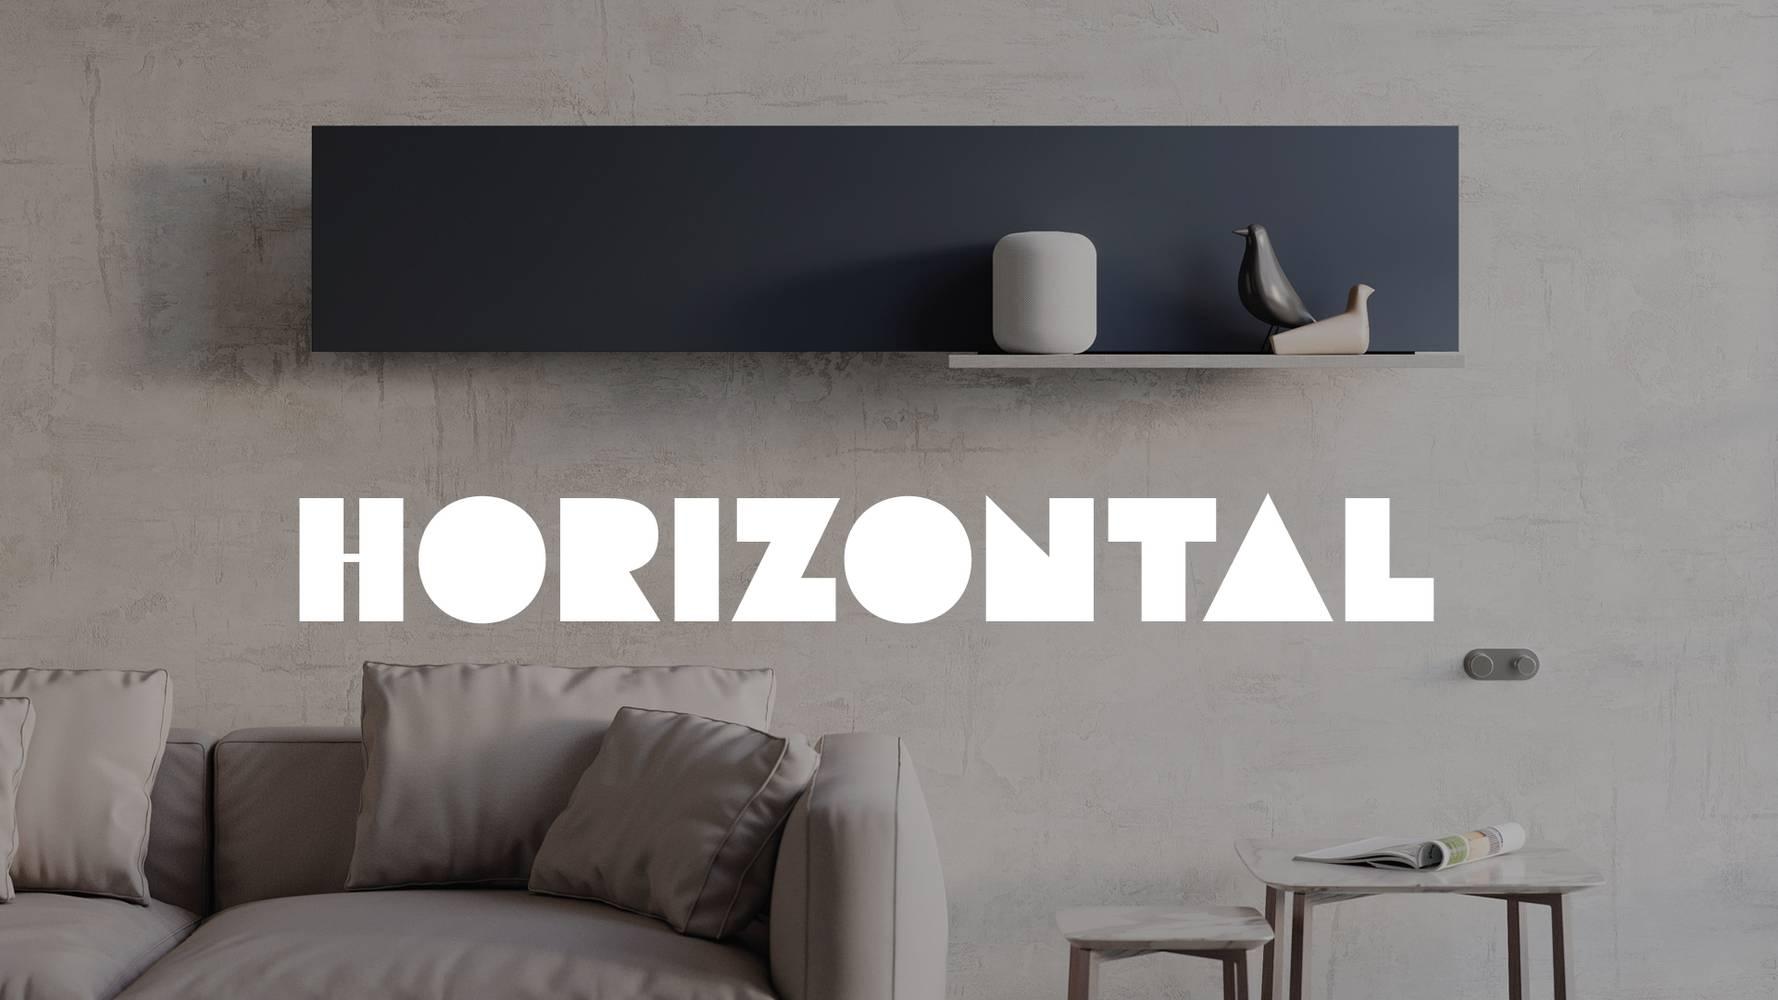 Horizontal